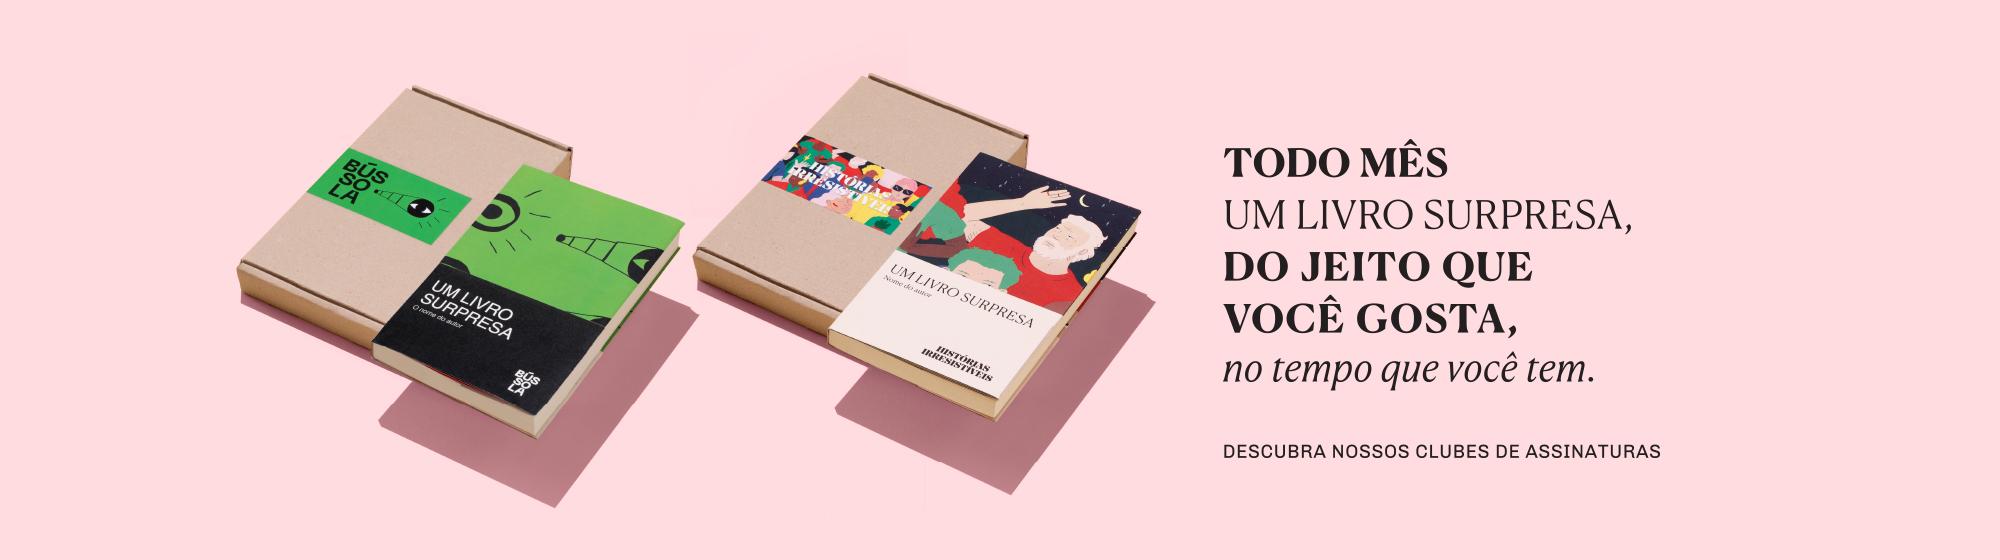 Banner departamento - TODOS